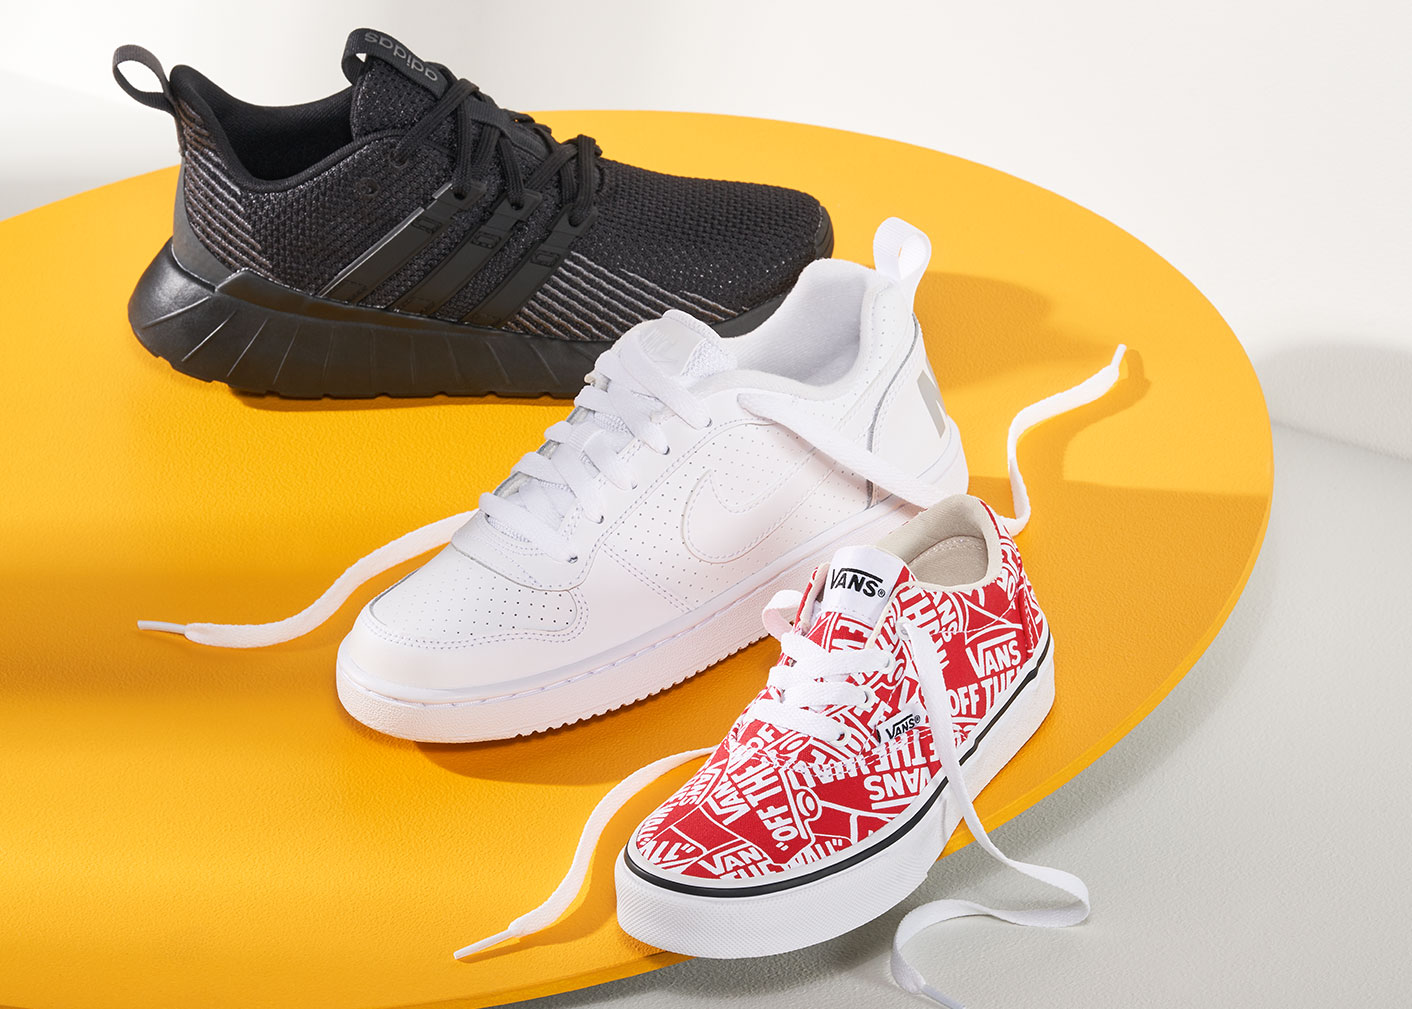 assorted adidas, nike, and  vans sneakers